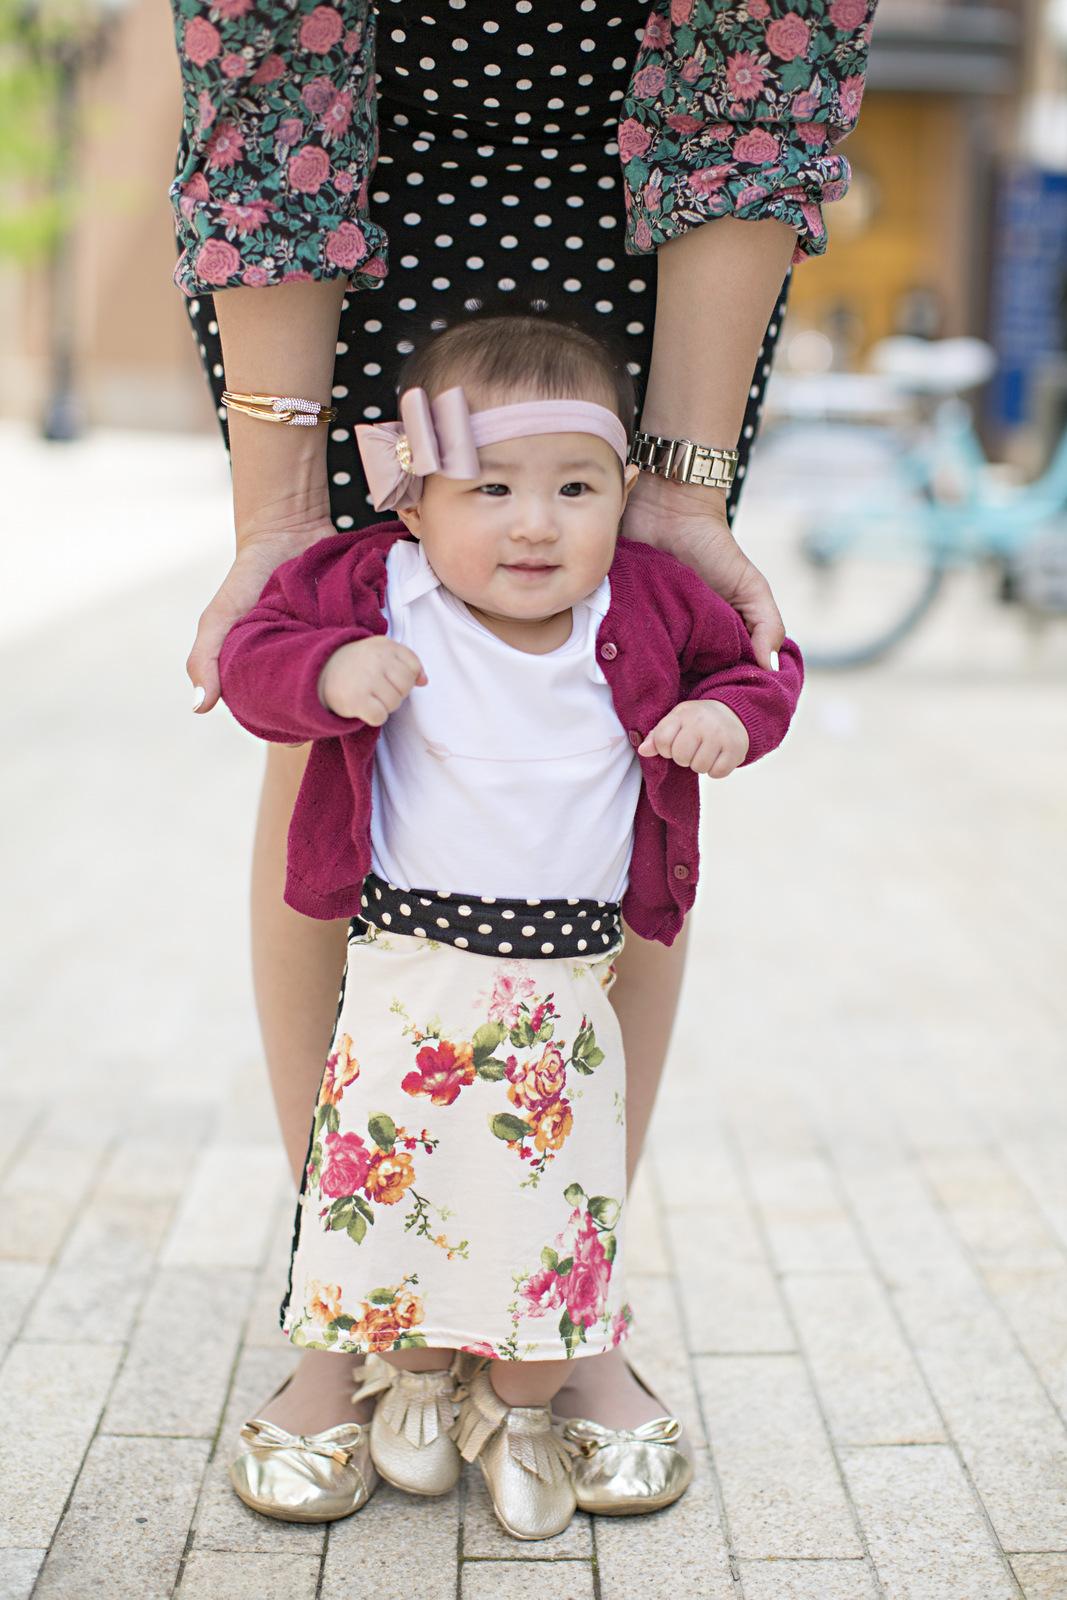 Sandy a la Mode | Mommy + Me Polka Dot and Floral